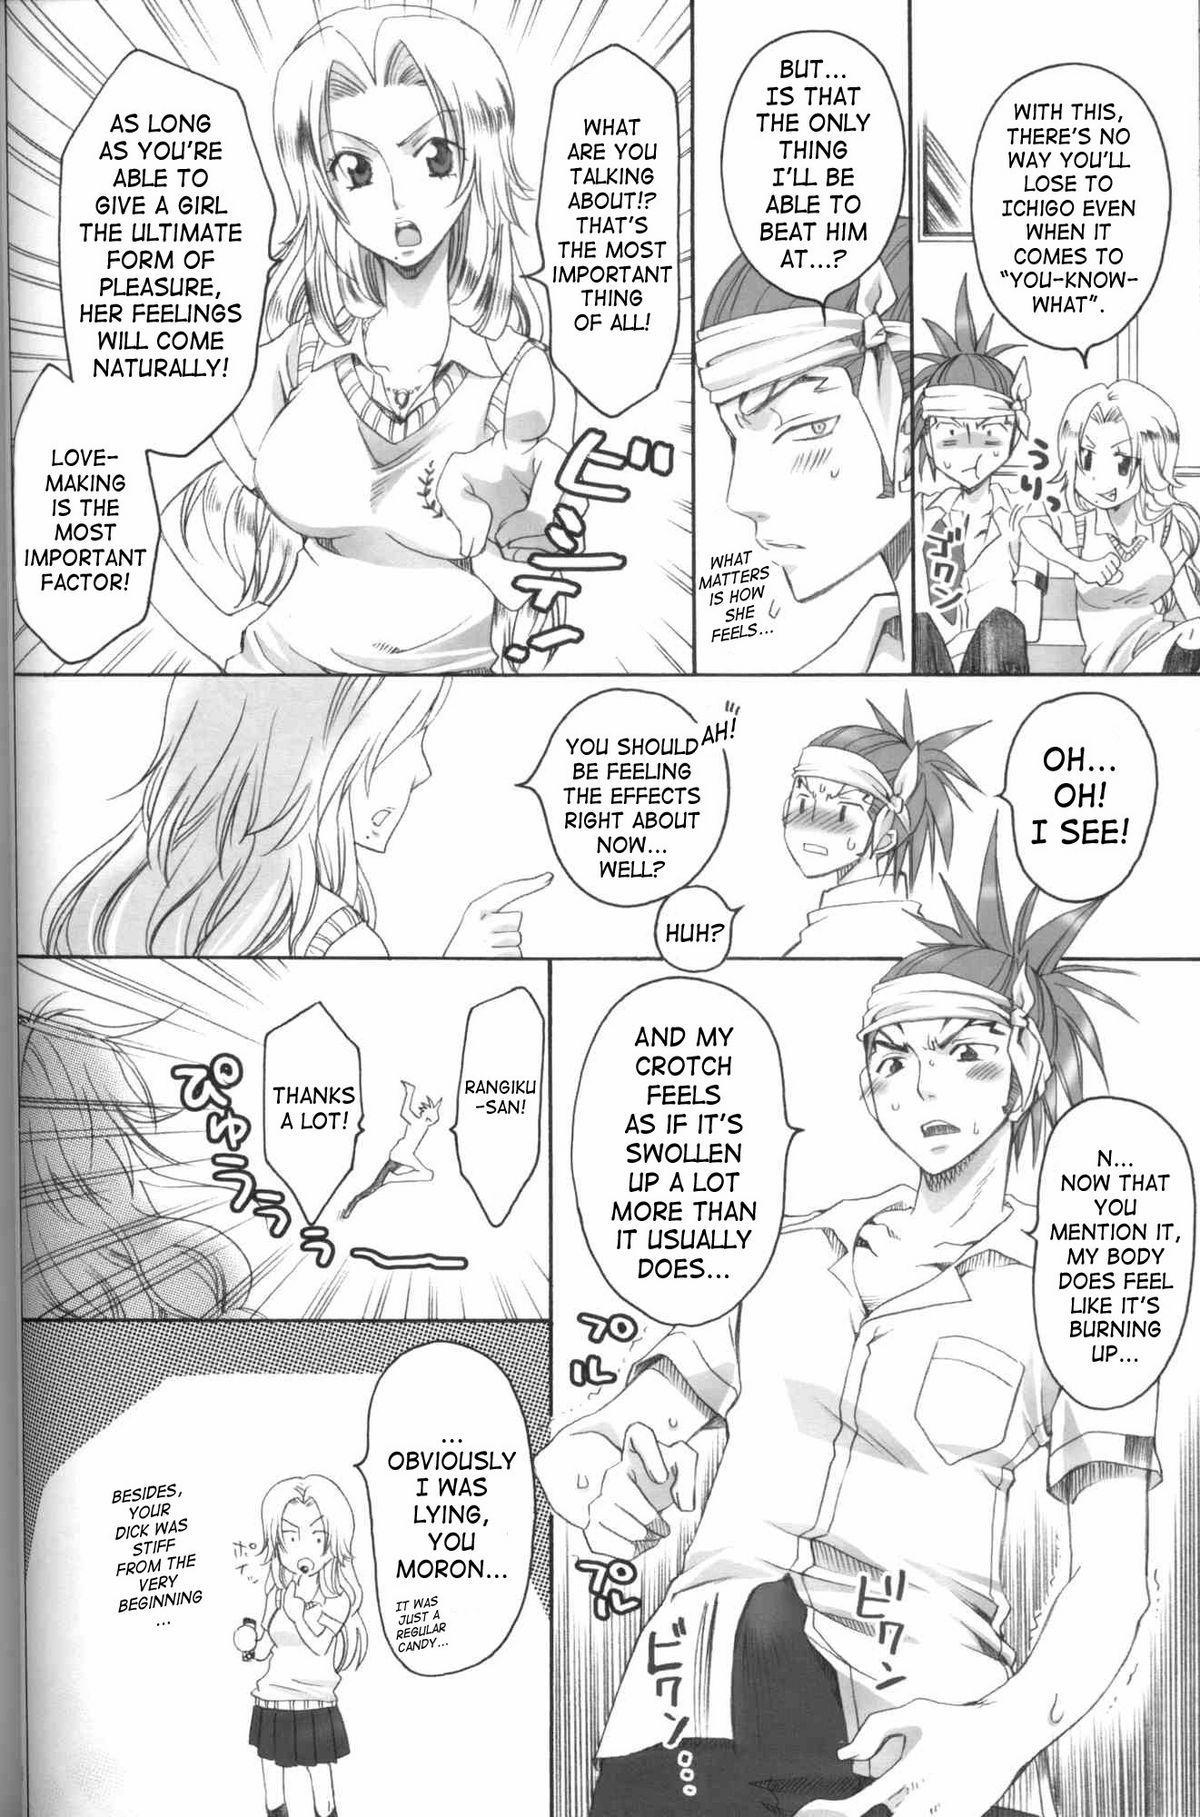 Kurosaki-ke no Shinigami | Shinigami of the Kurosaki Family 14